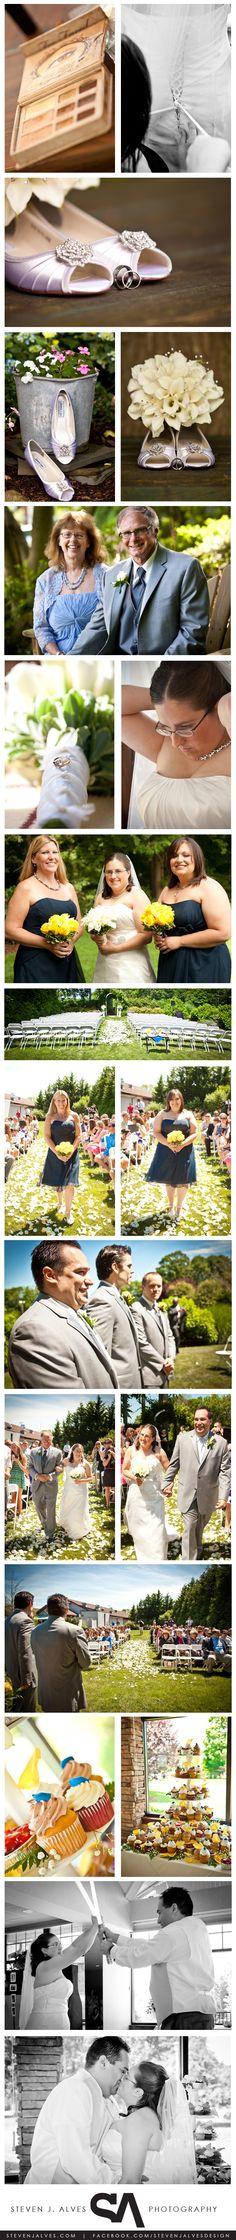 Jen & Nacho Wedding Composition by StevenJAlves.com - Wedding Photography